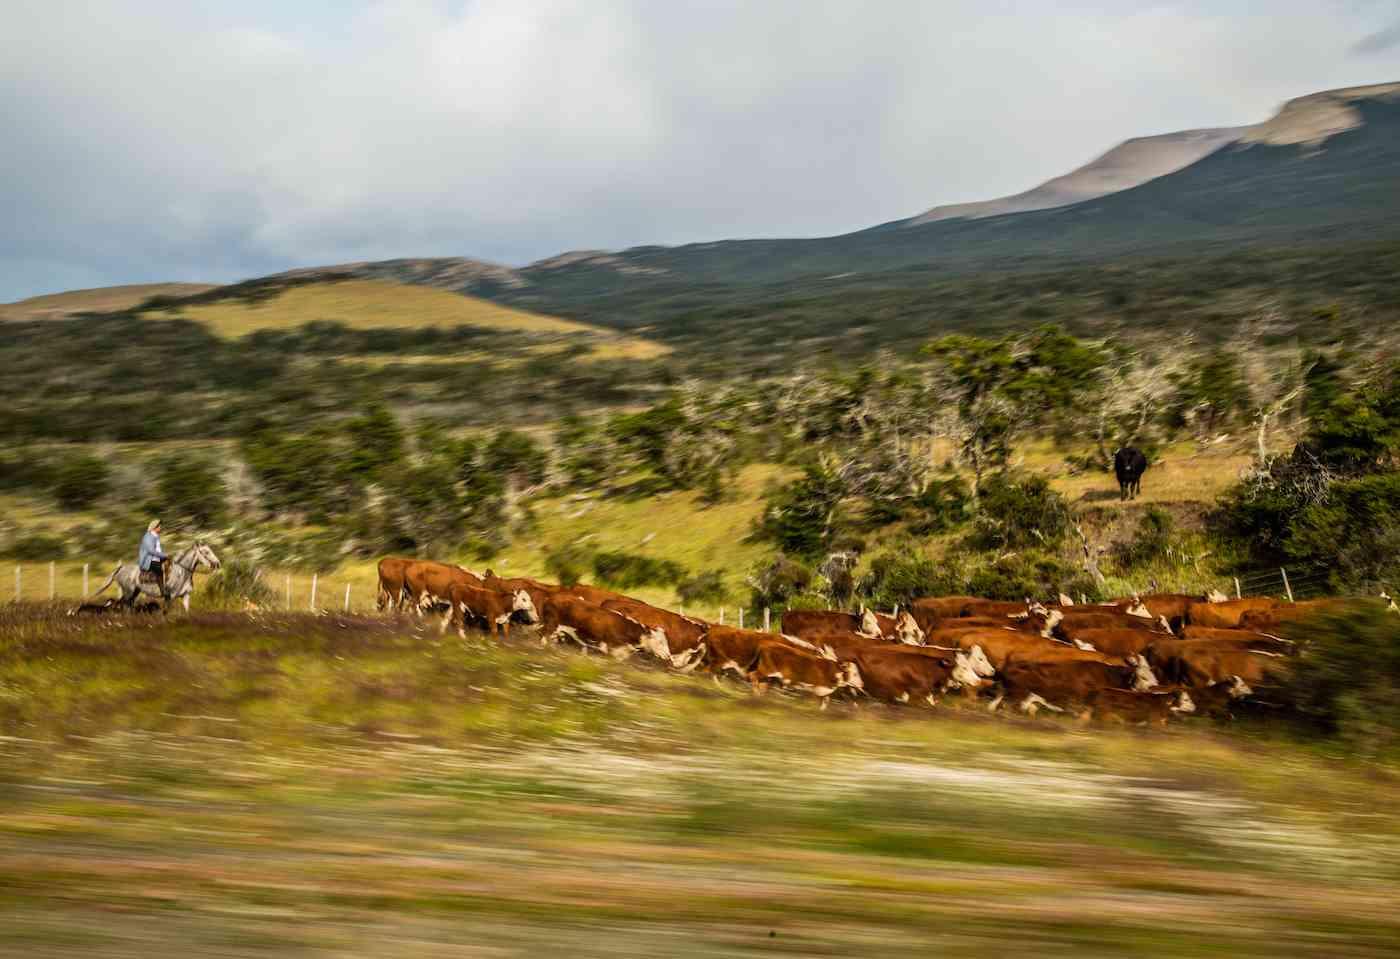 Cow herd and gaucho